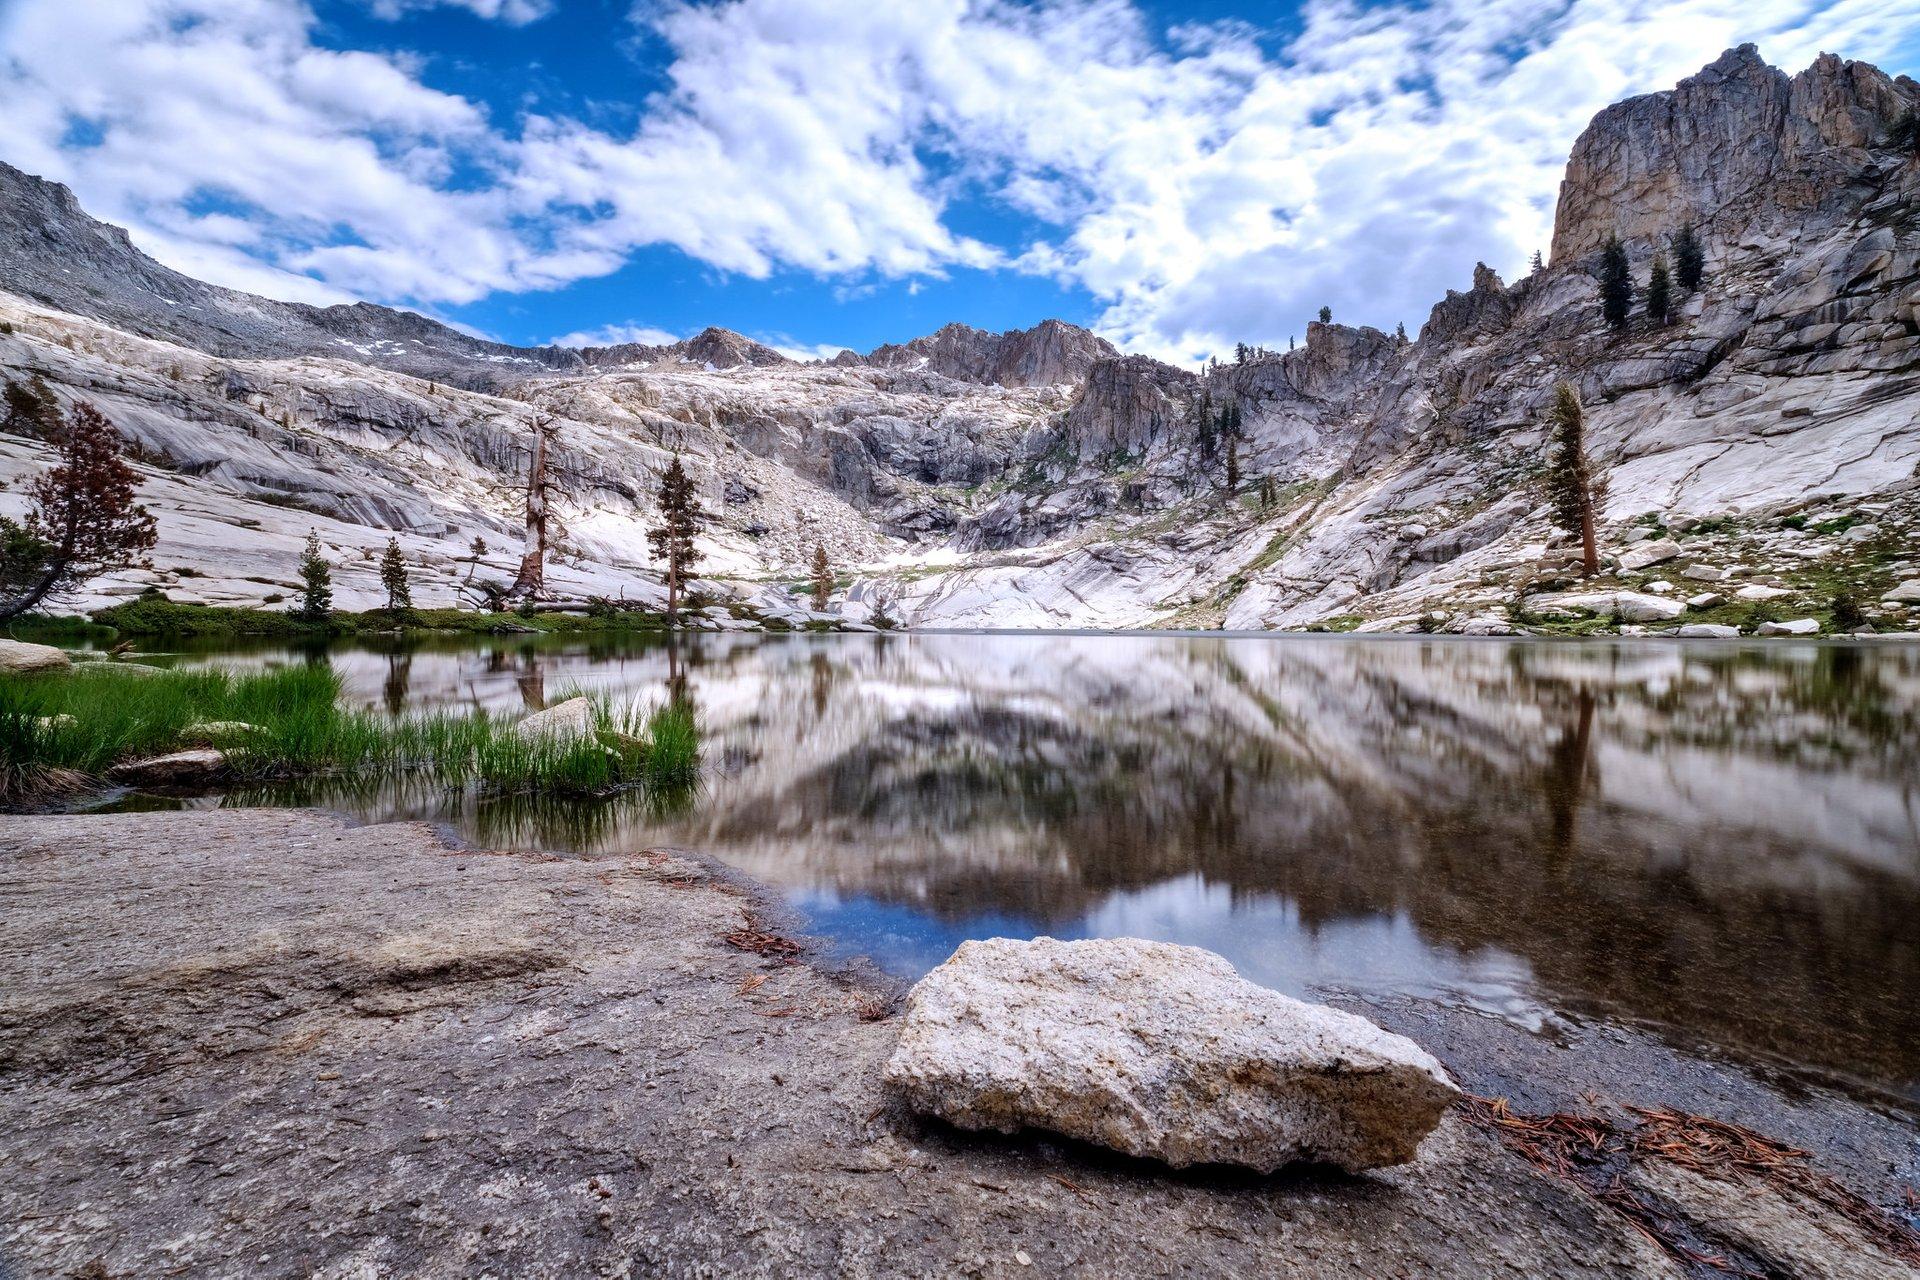 Pear Lake Trail in California 2020 - Best Time